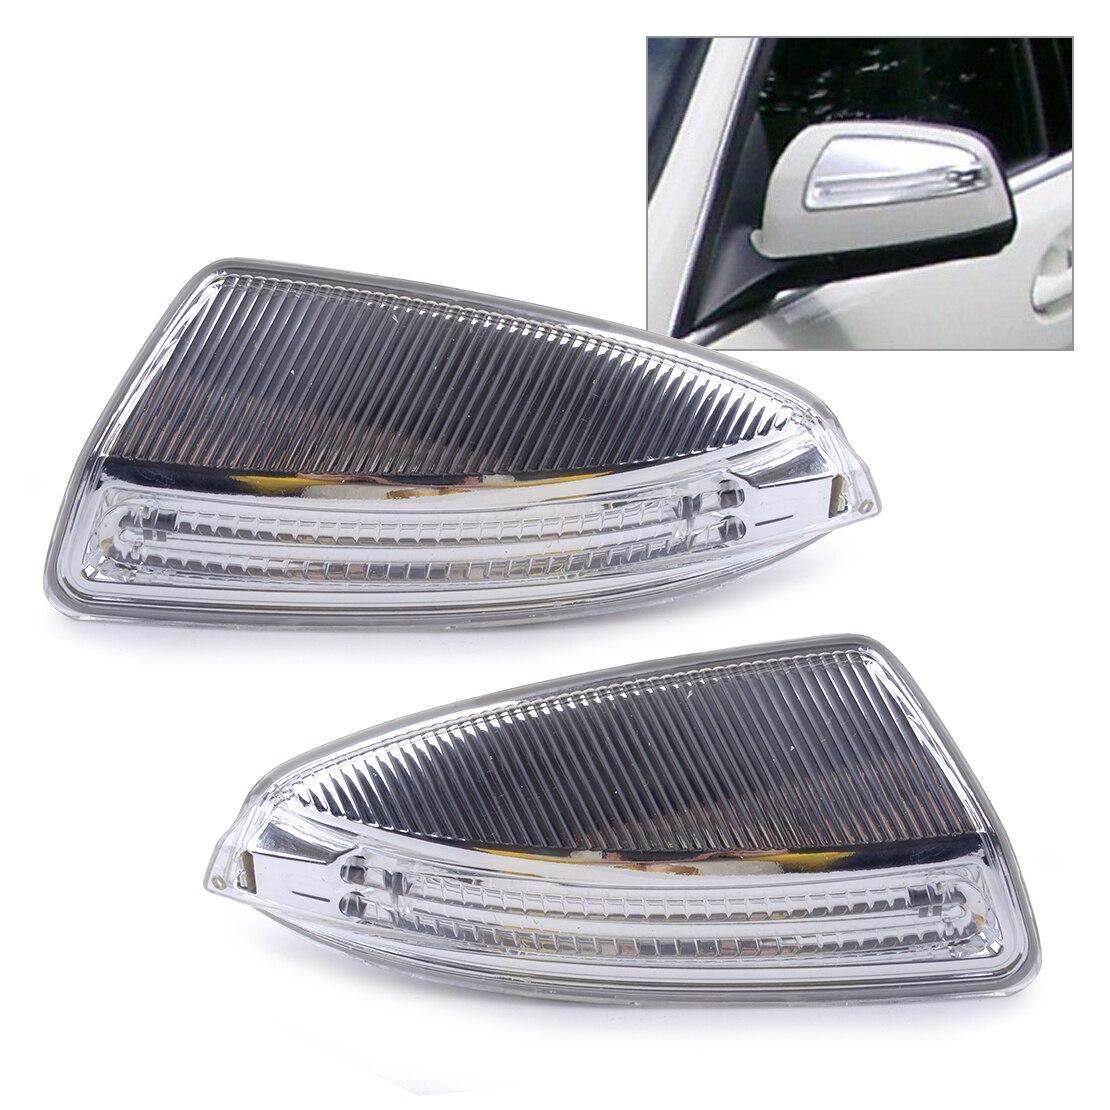 CITALL 1 Pair Car Rear Door Mirror Turn Signal Yellow Light 12V For Mercedes W204 C250